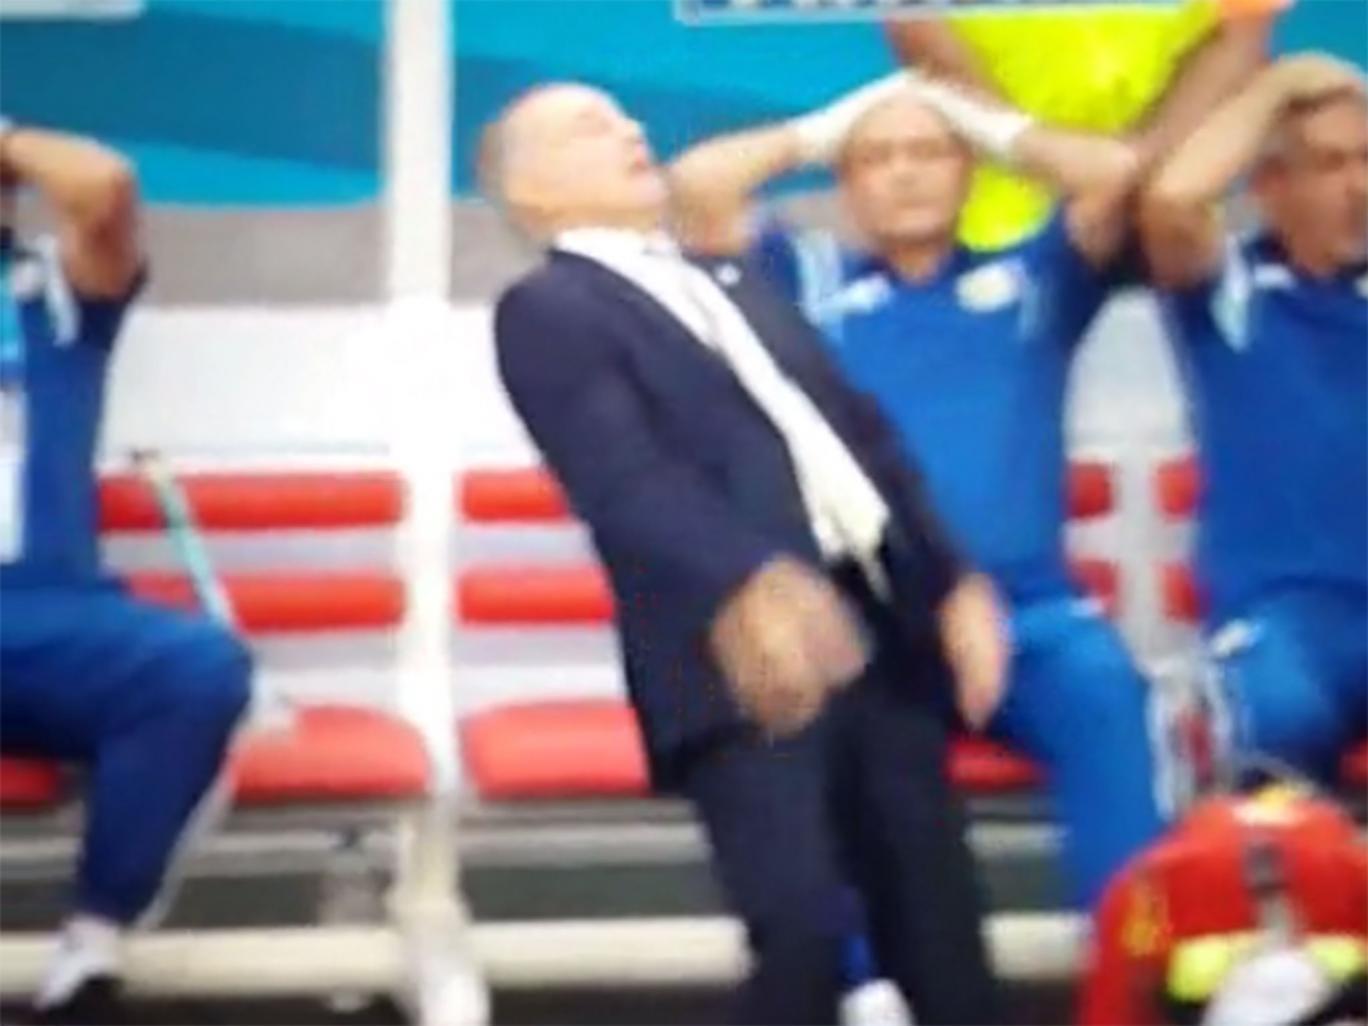 Alejandro Sabella reacts after Gonzalo Higuain's shot hits the bar